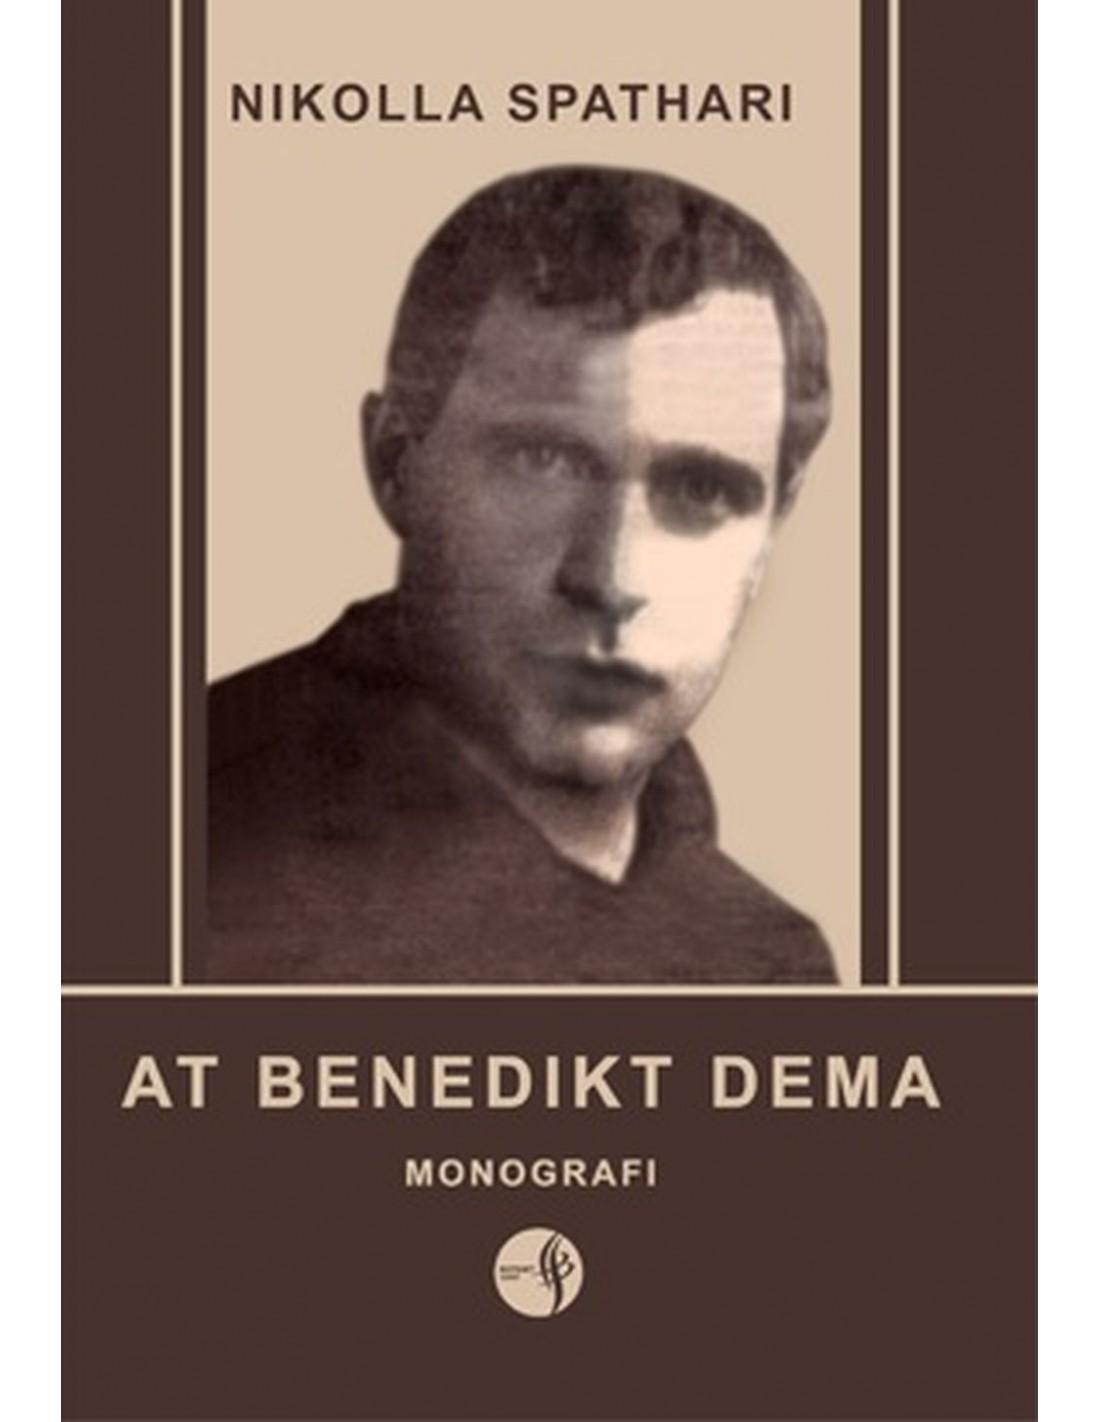 At Benedikt Dema